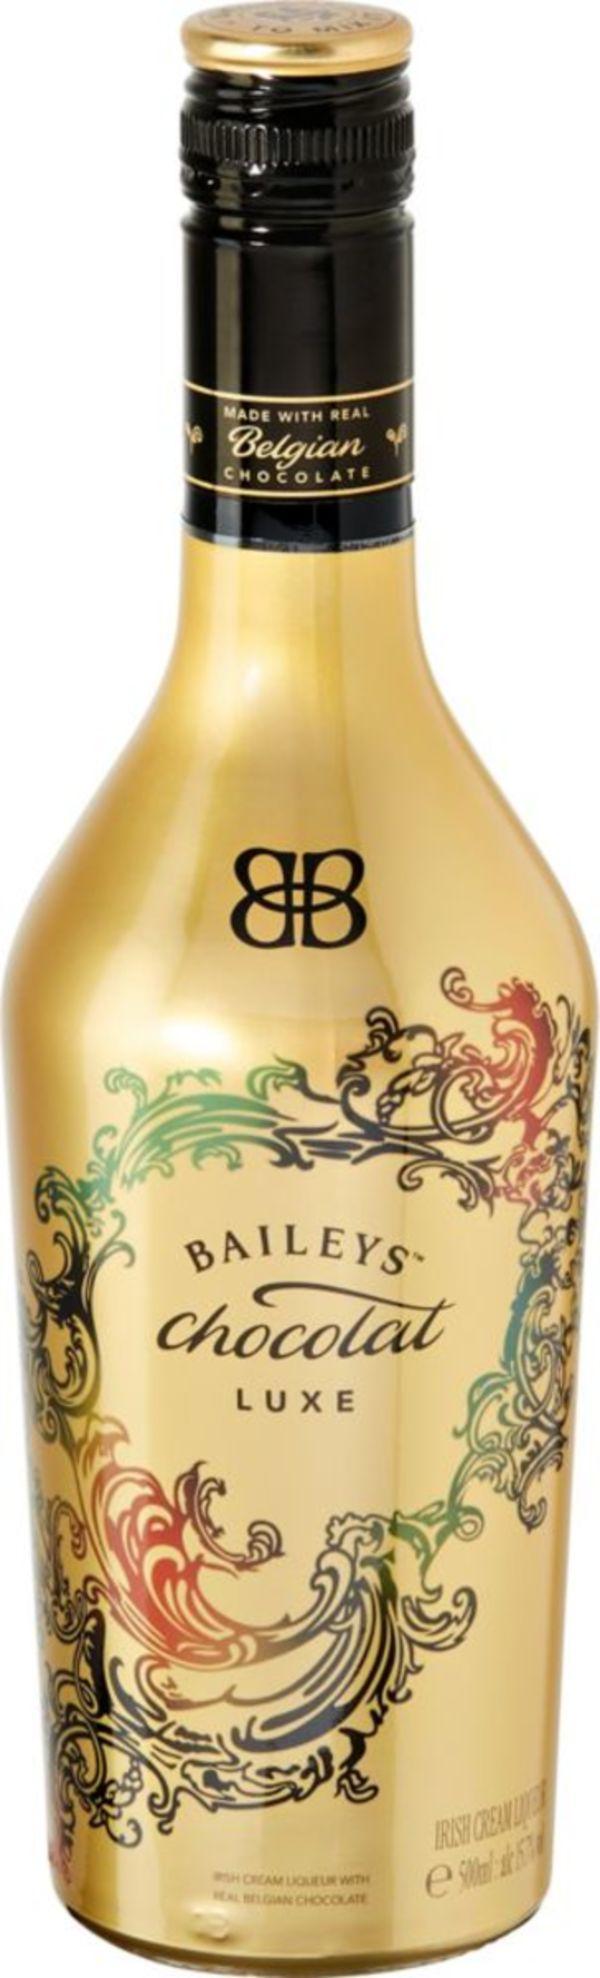 Baileys Chocolate Luxe Irish Cream Likör 0,5 Liter